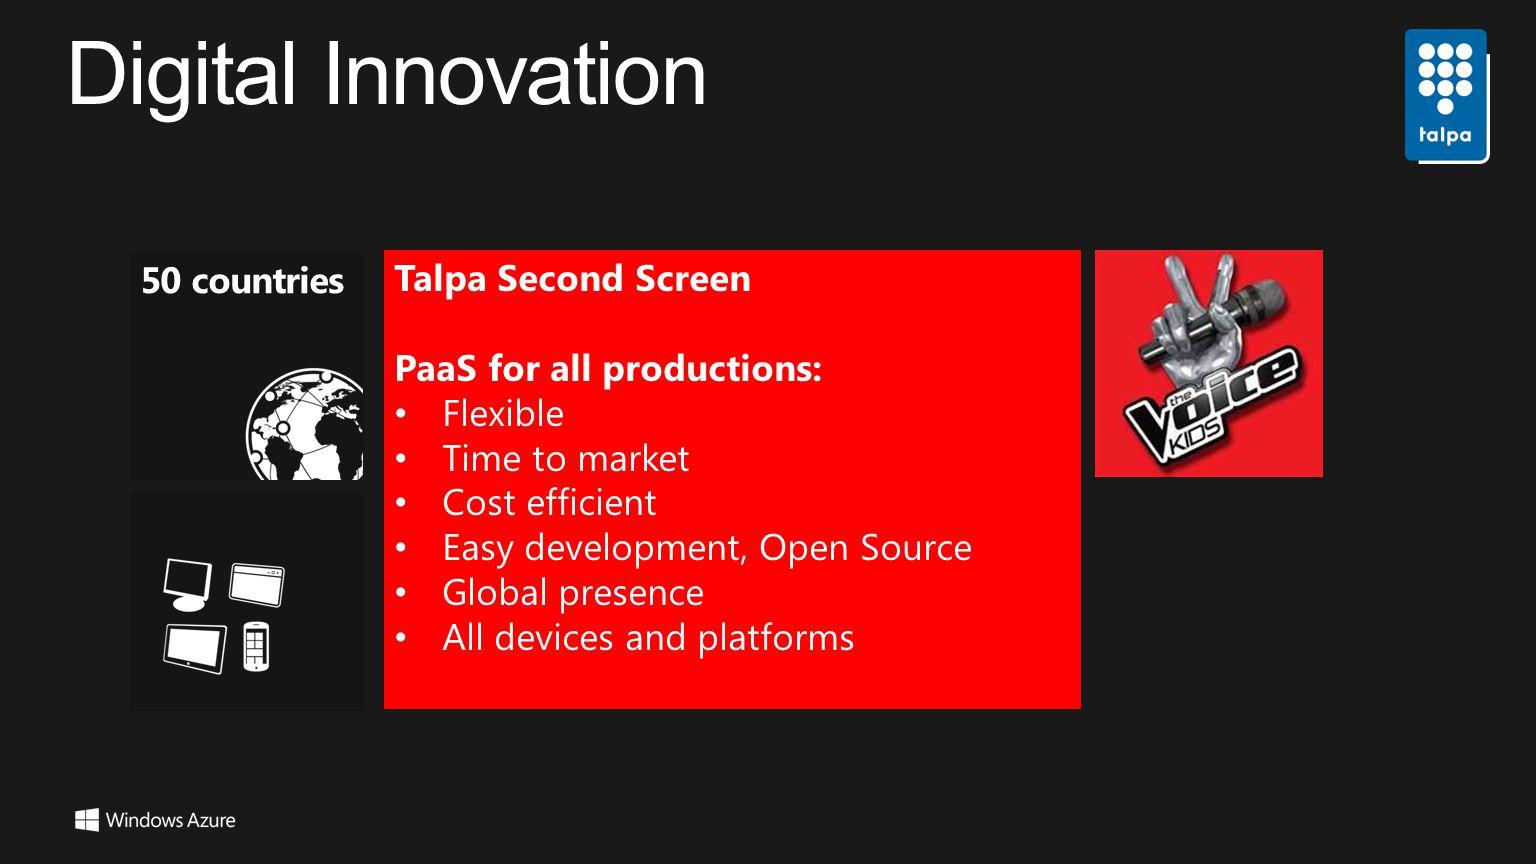 Digital Innovation 50 countries Talpa Second Screen